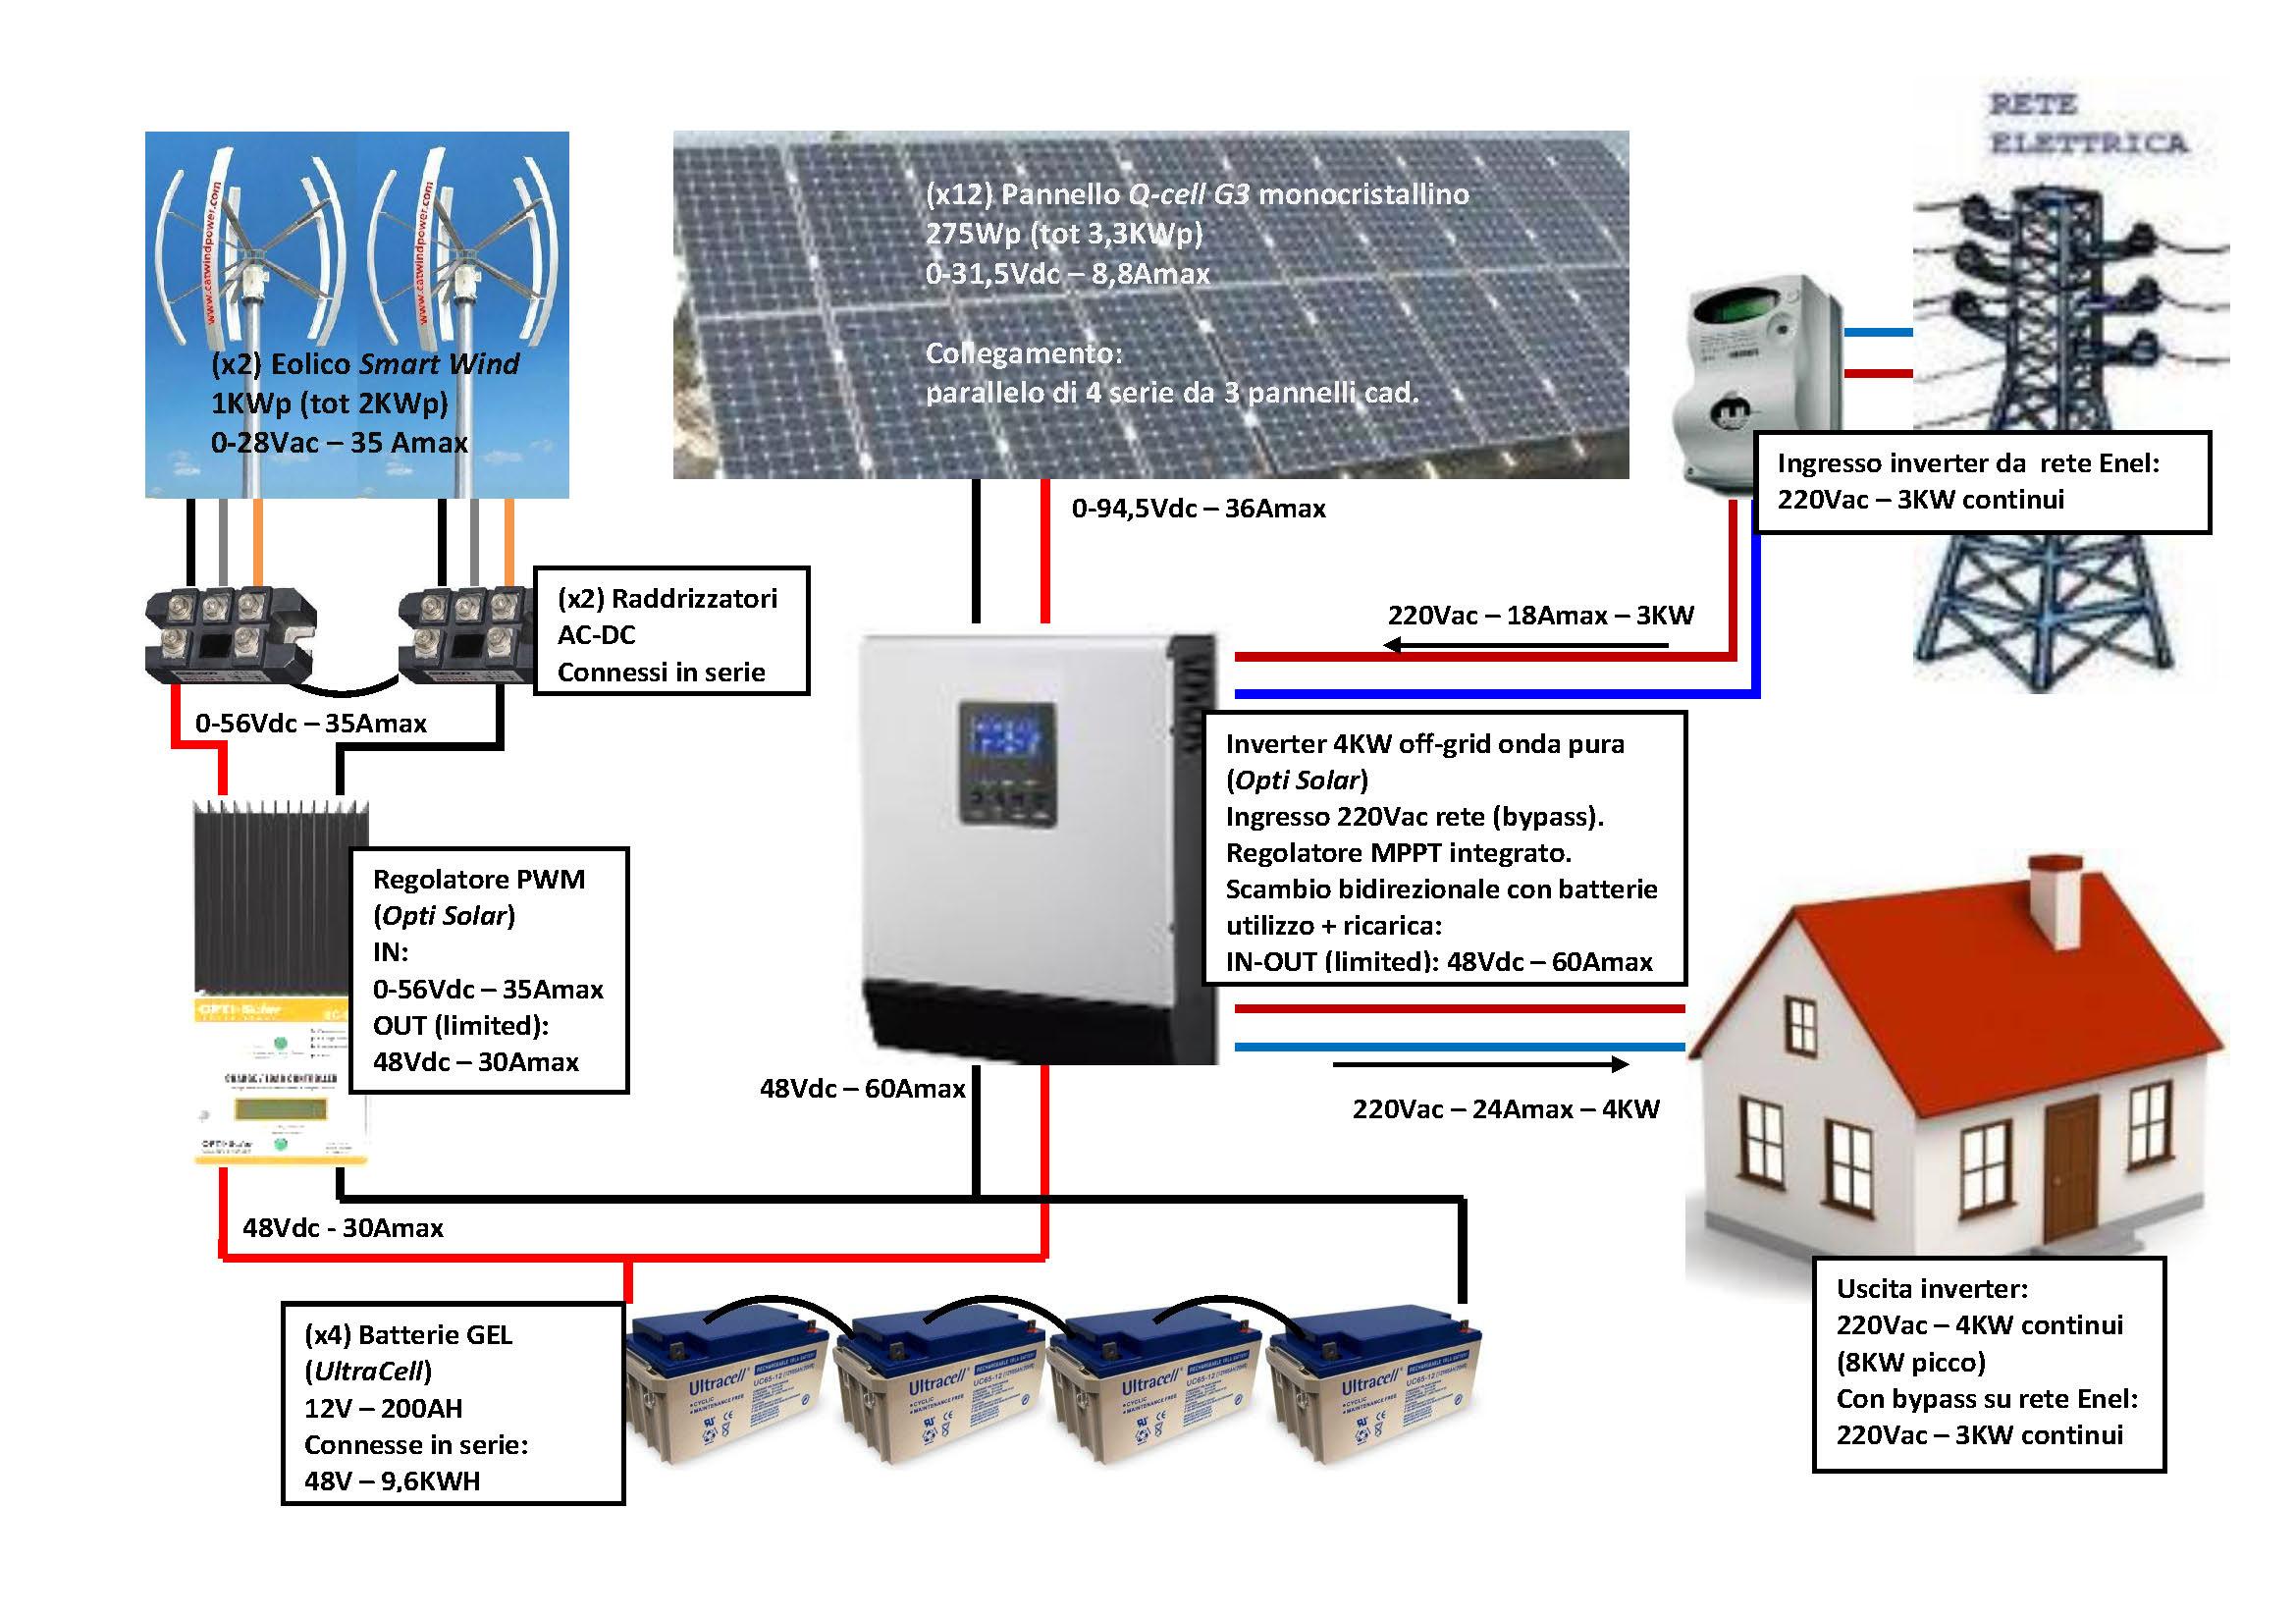 impianto isola eolico fotovoltaico help fai da te